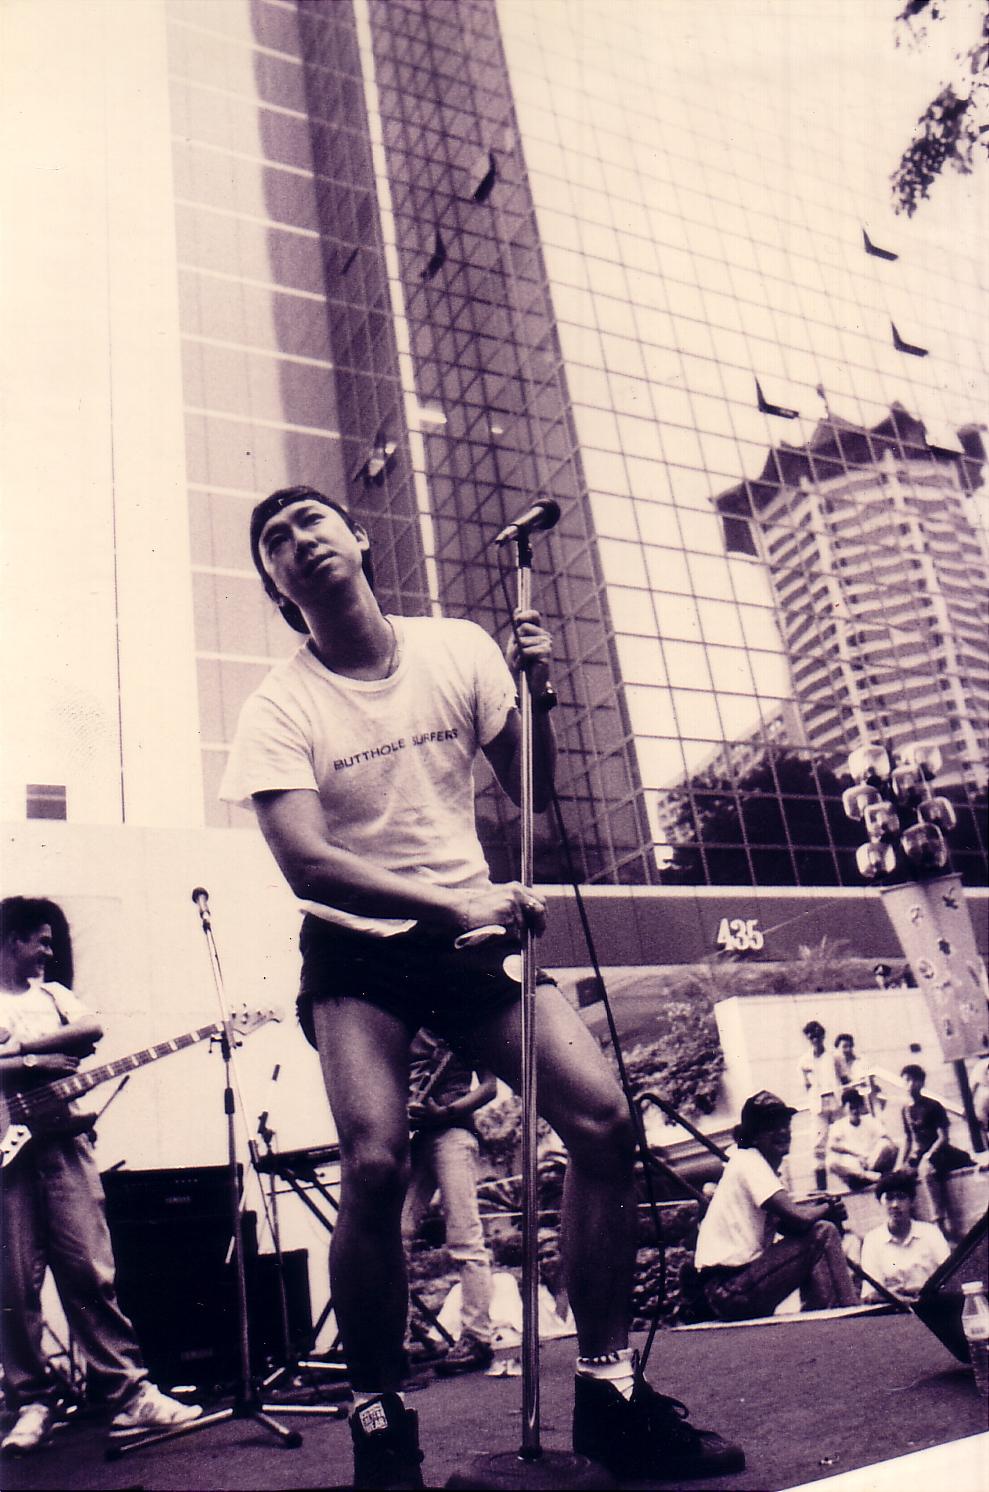 Chris Ho X'ho Singapore DJ musician Zircon Lounge obituary